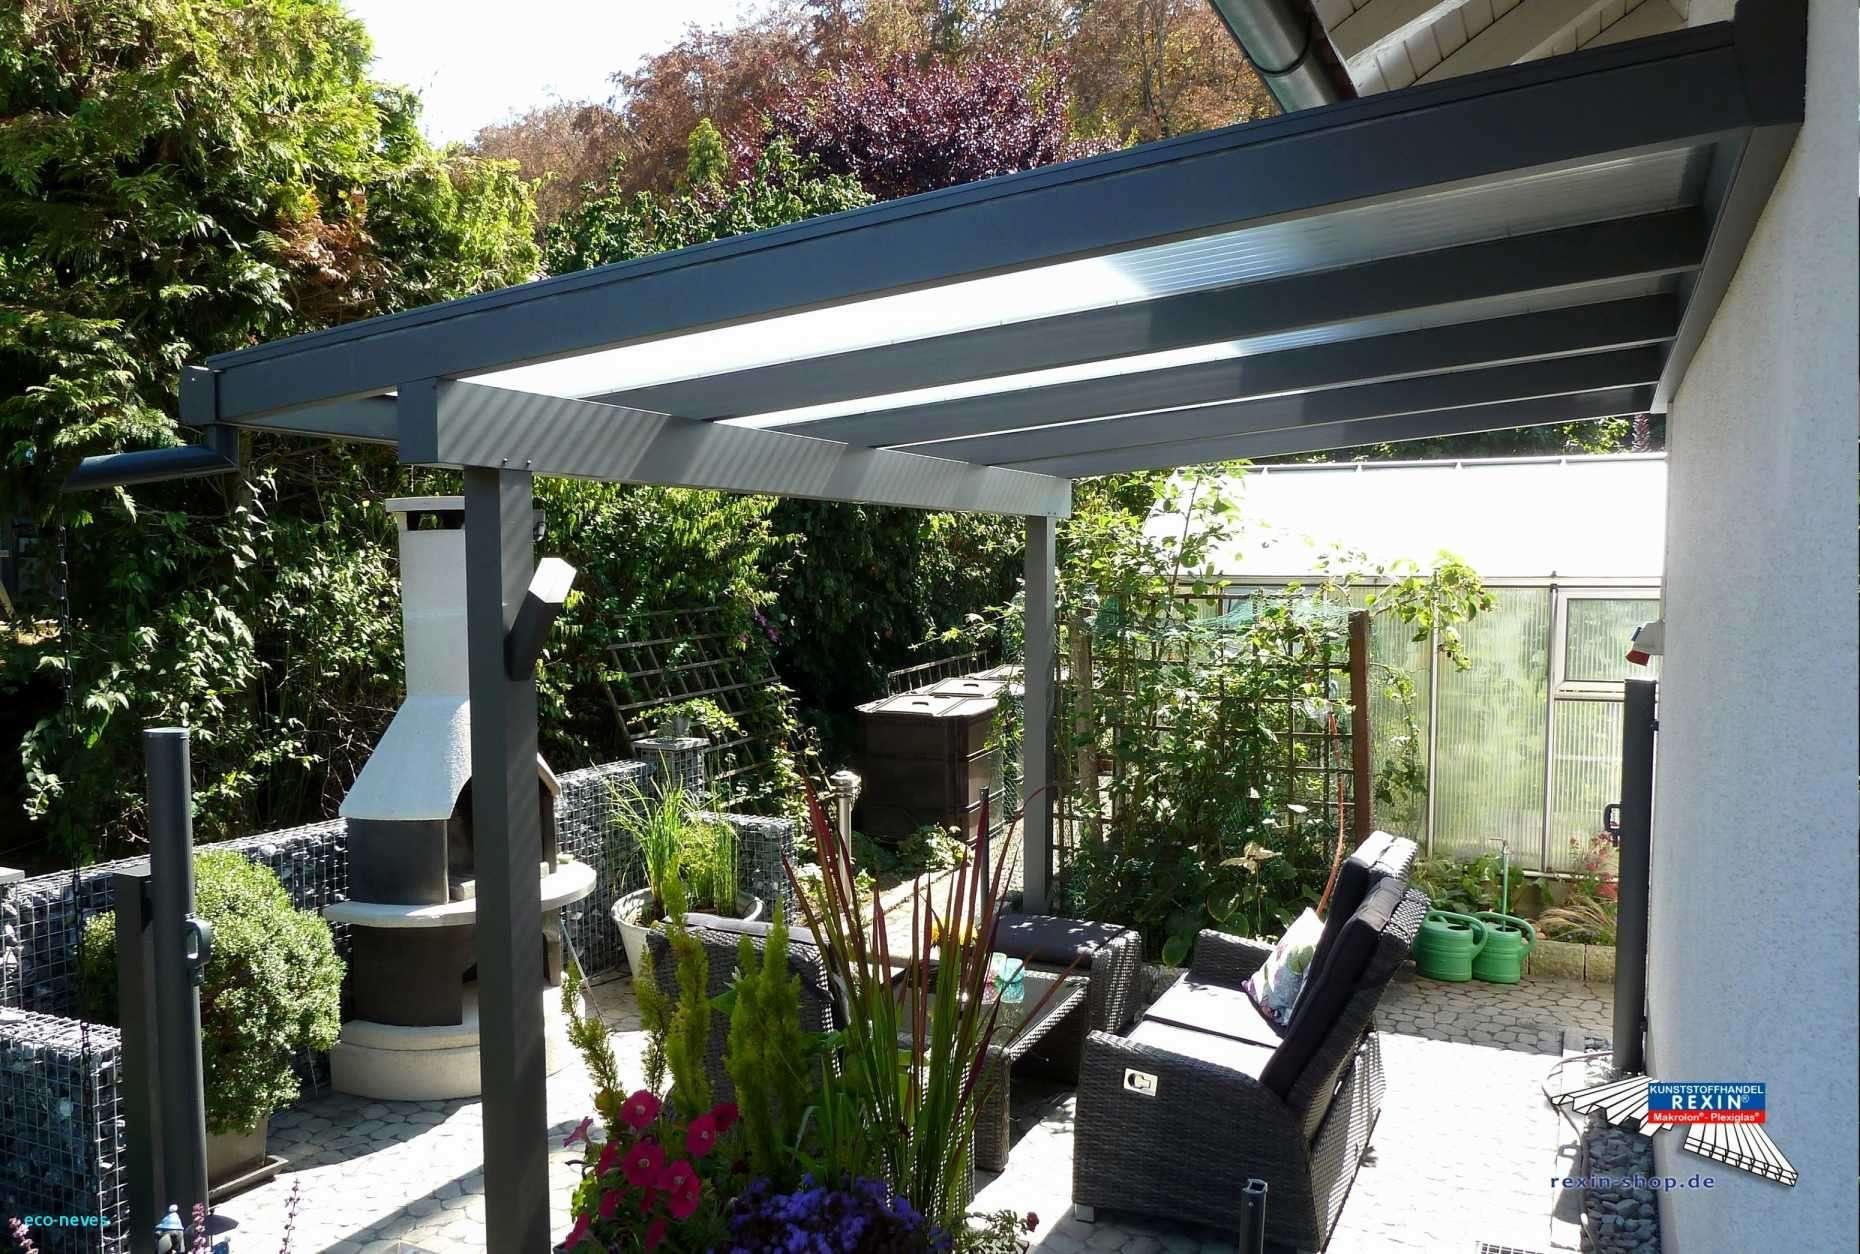 roof garden design awesome mauer im garten 42 motiv of roof garden design